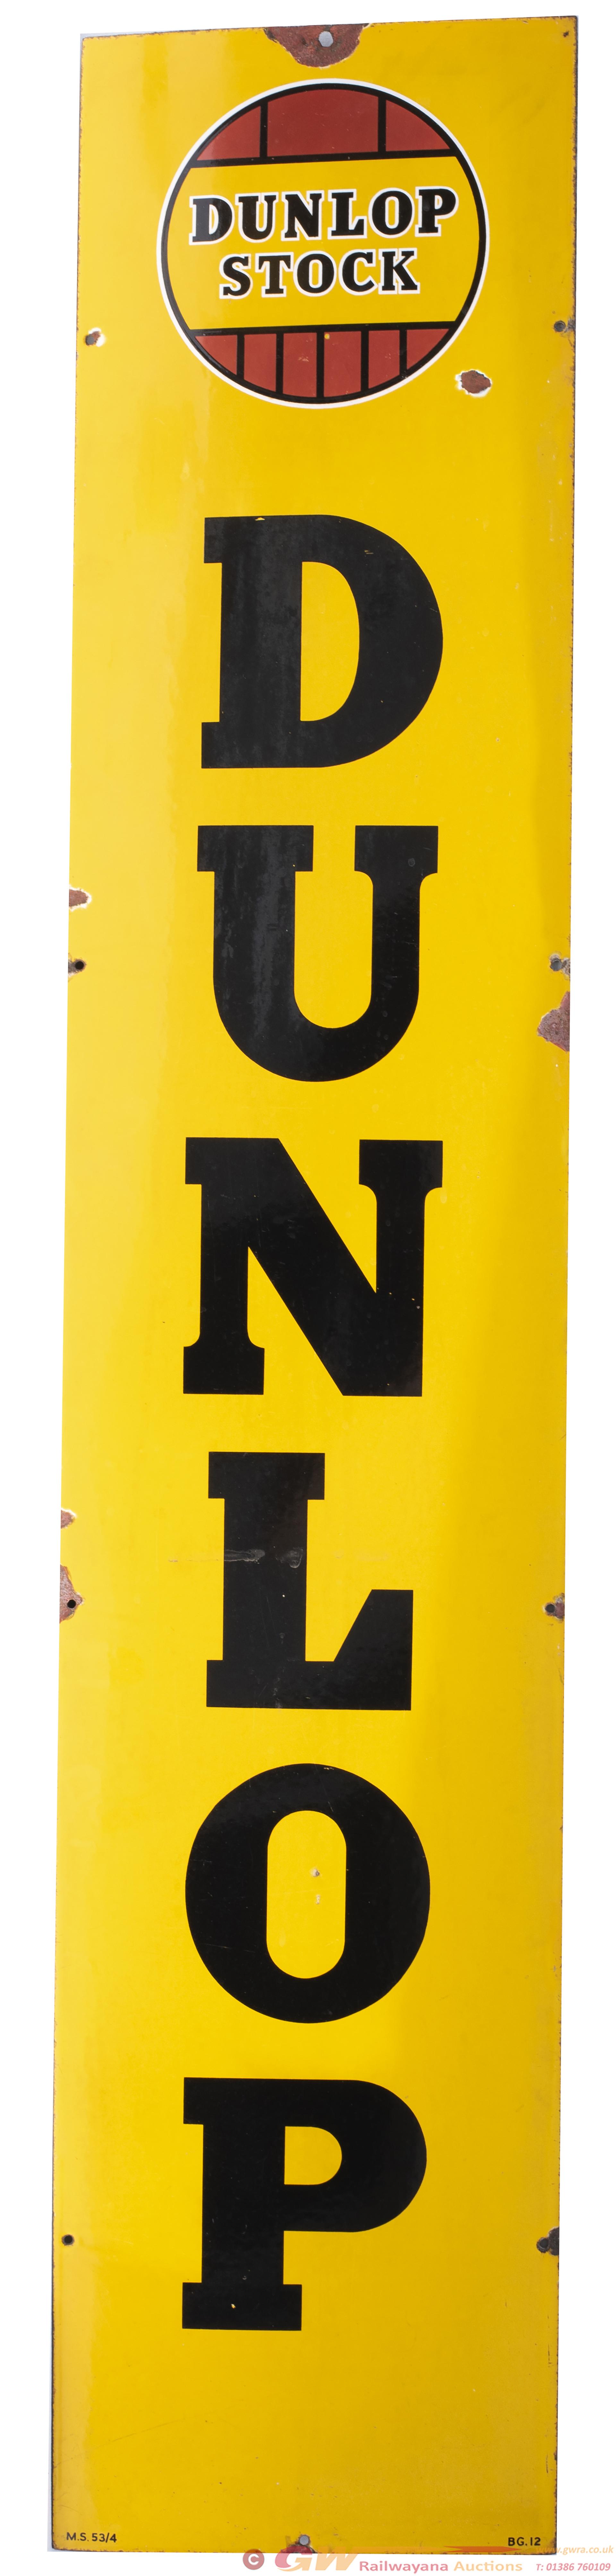 Advertising Enamel Sign DUNLOP STOCK With DUNLOP